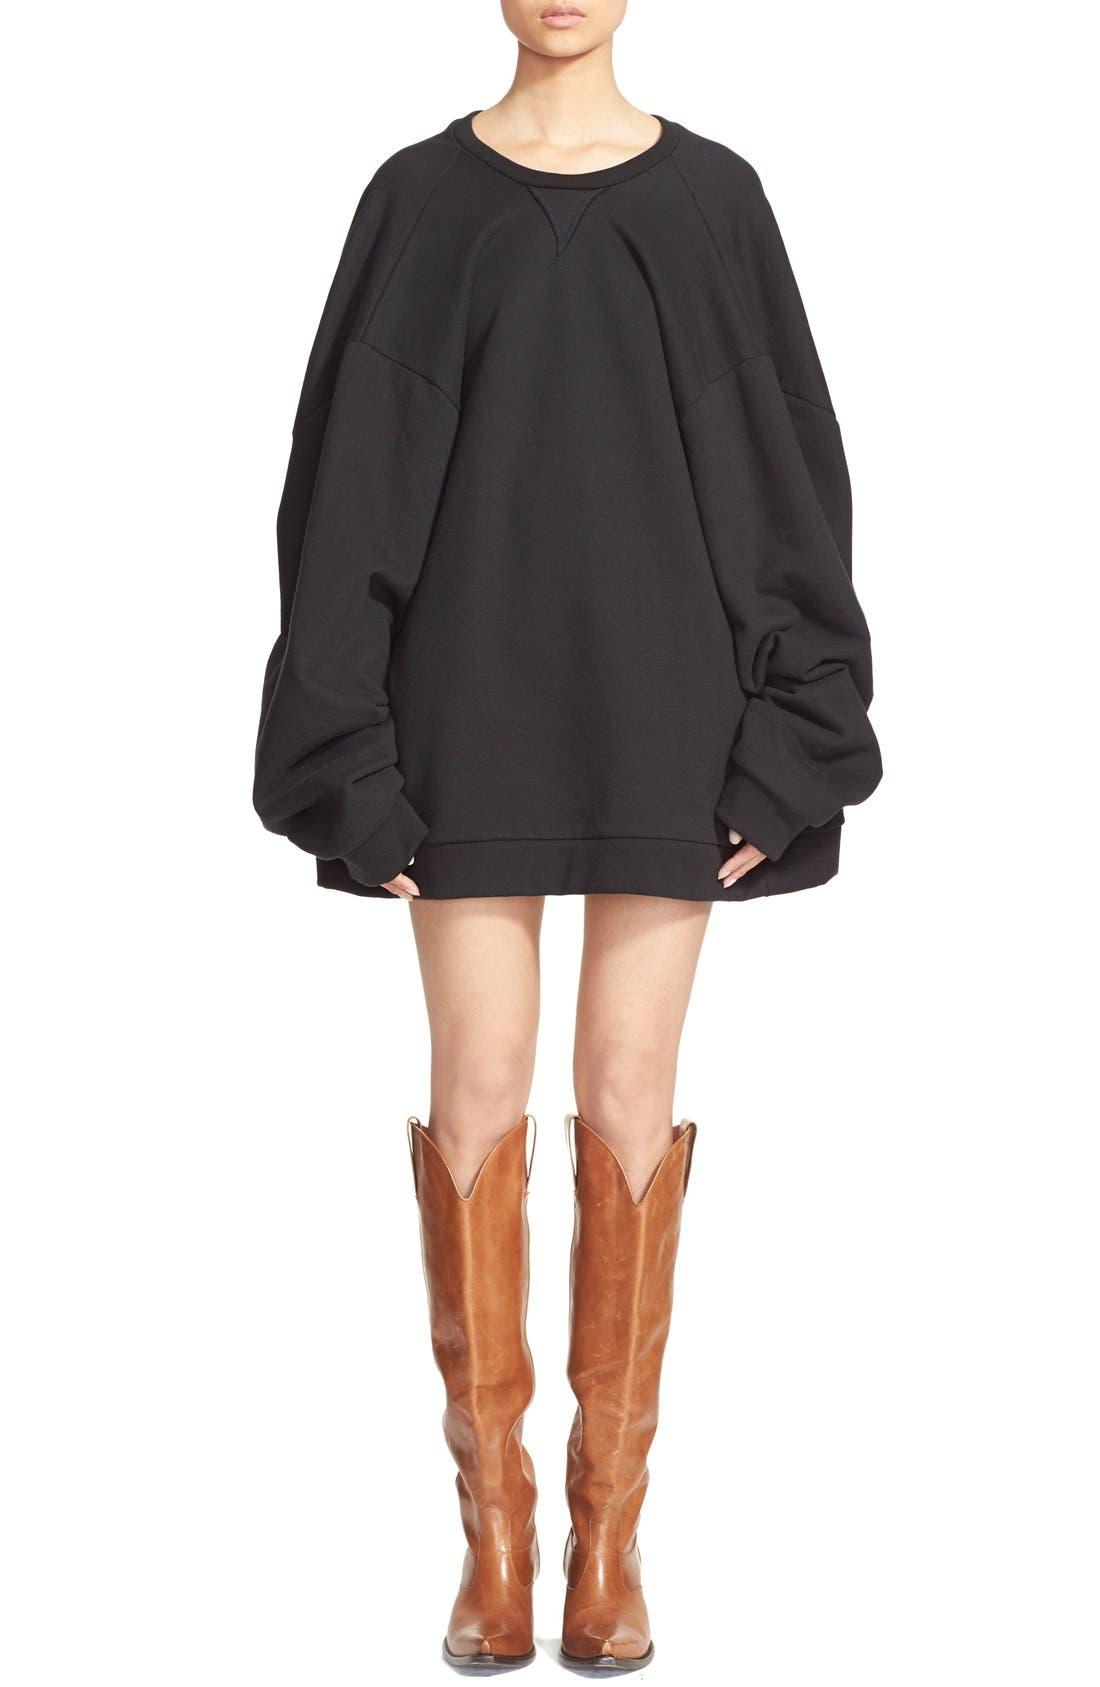 Alternate Image 1 Selected - Vetements Oversize Crewneck Sweatshirt